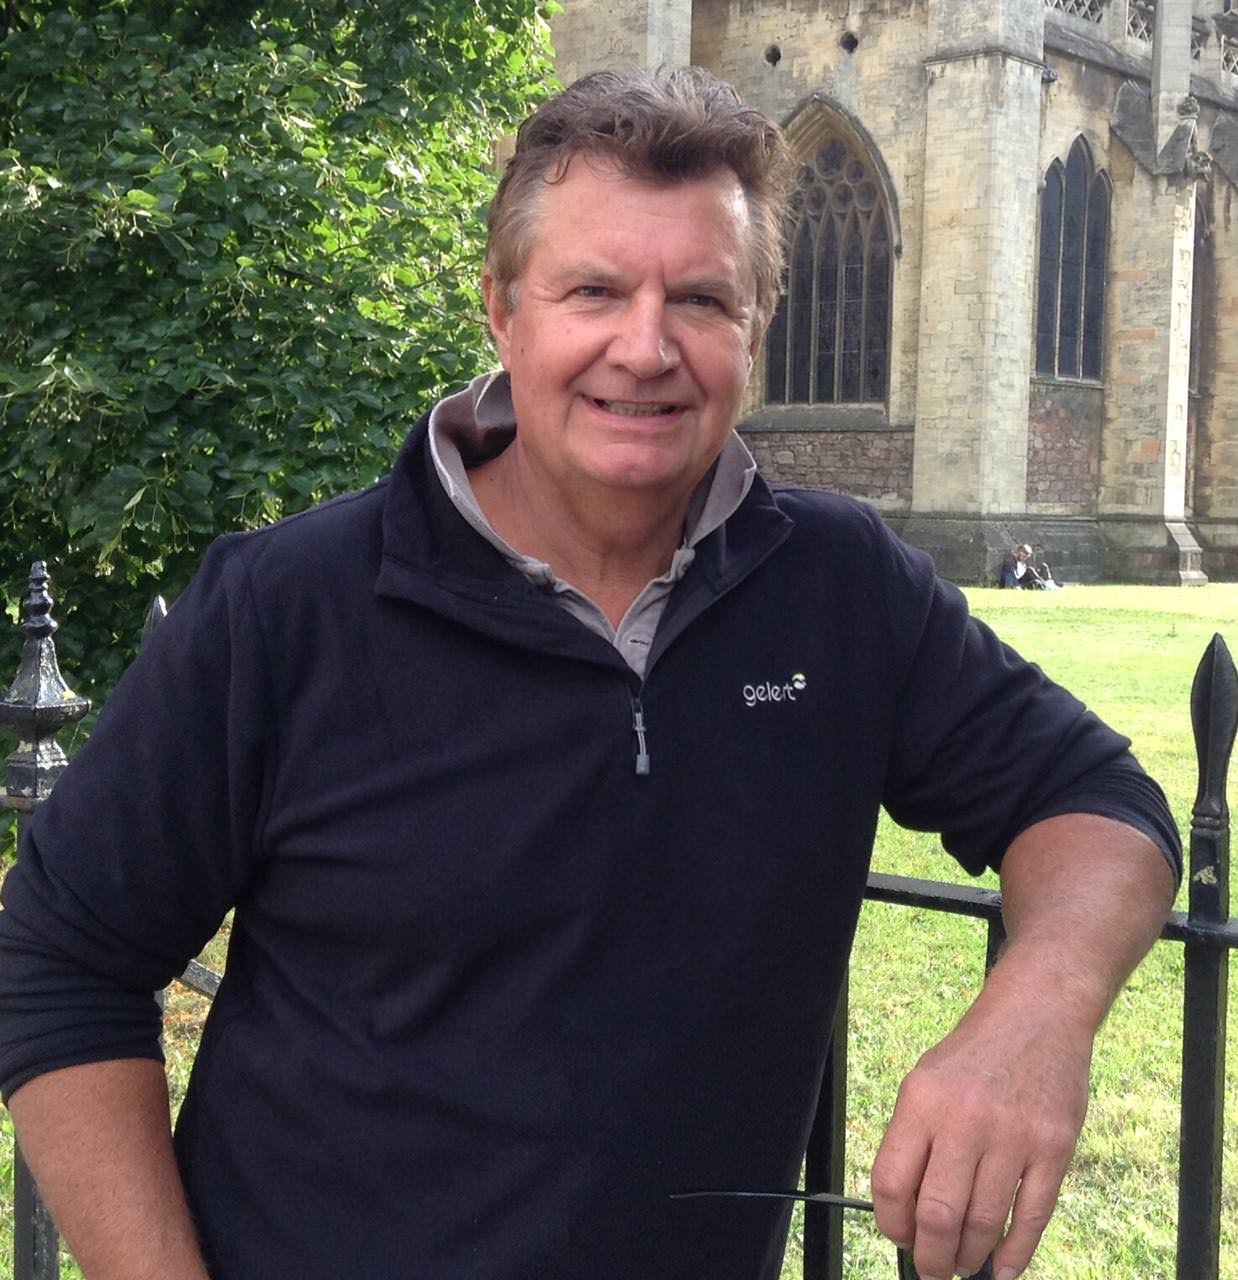 Mark Hamlin Professional Stonemason & Landscaper